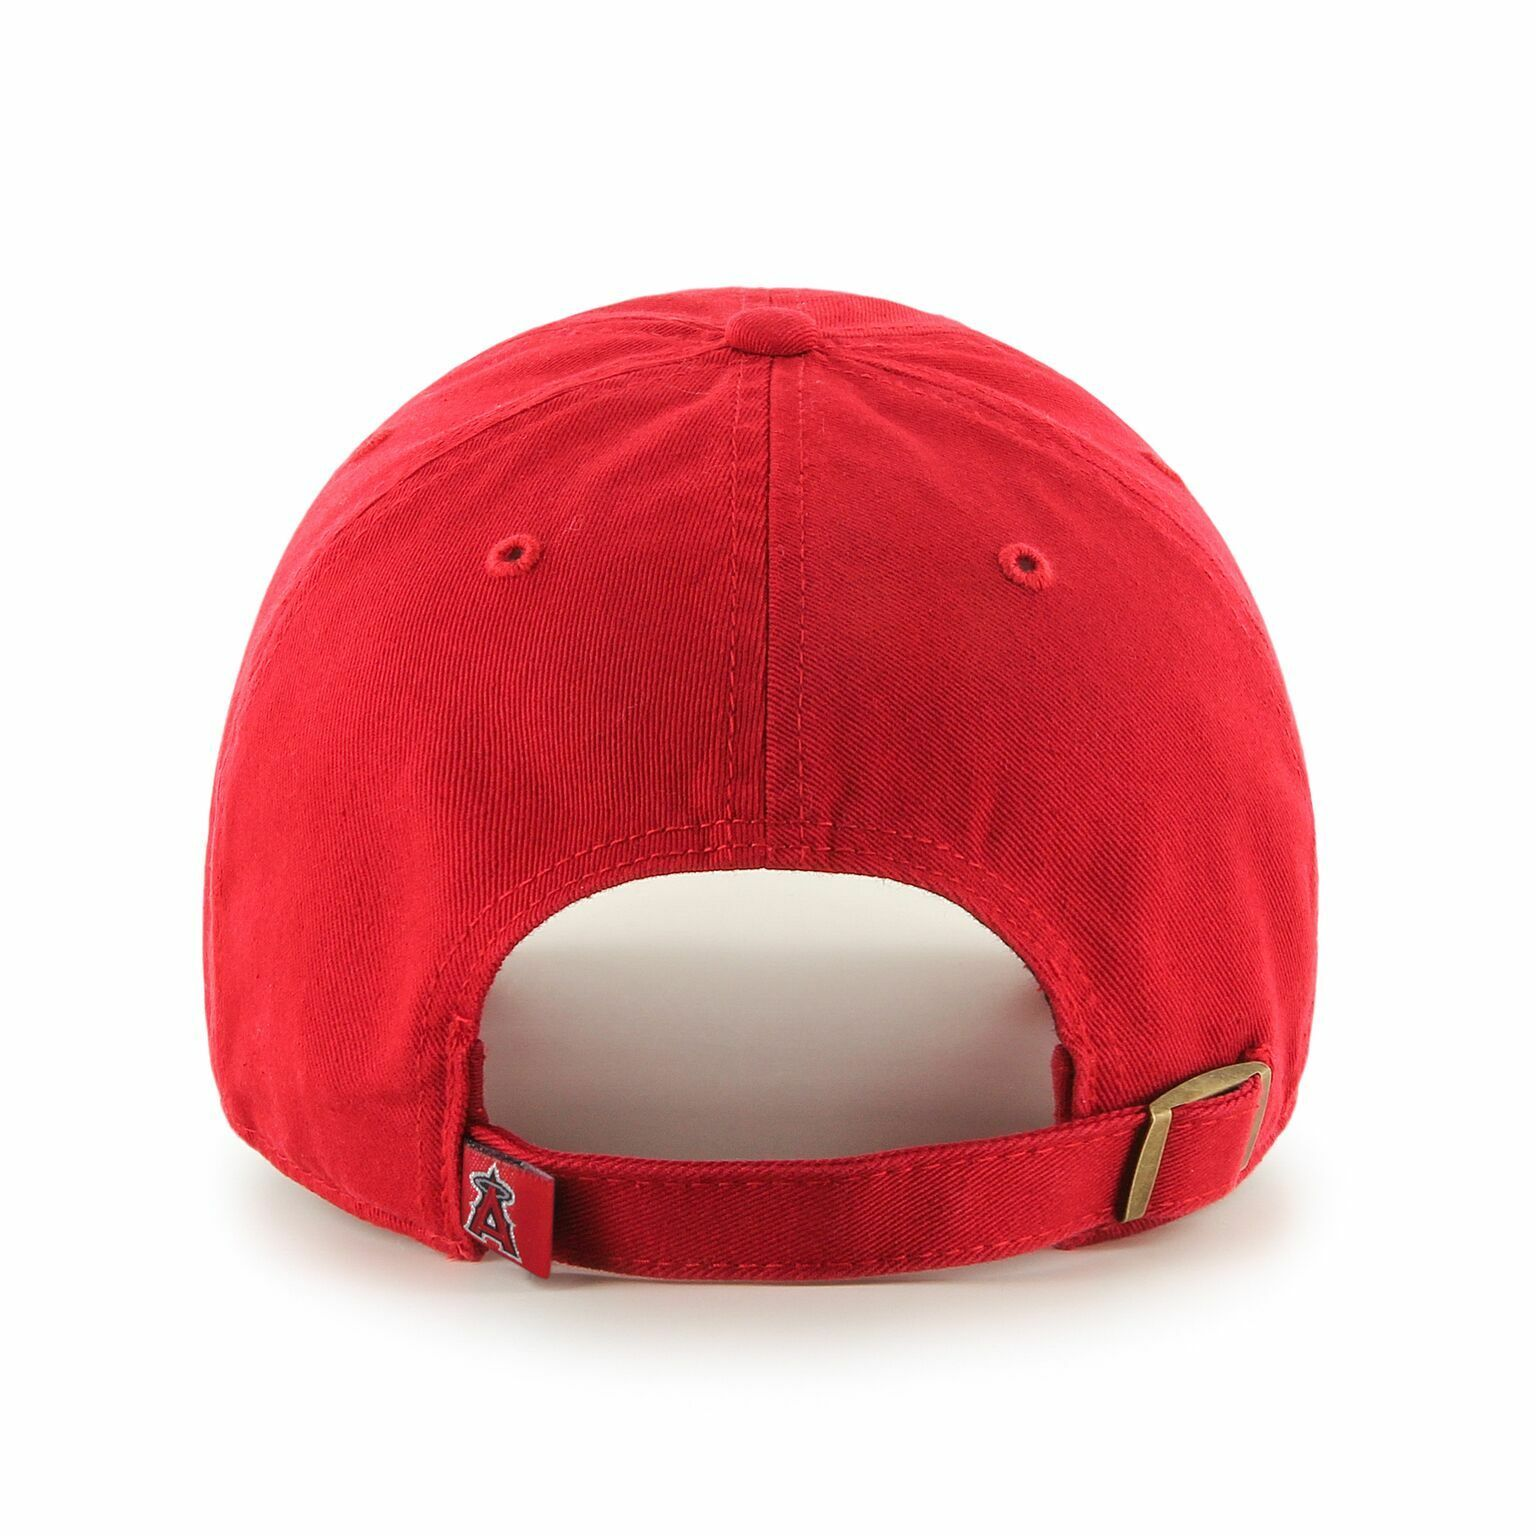 MLB MLB MLB Los Angeles Angels L.A. Cap Basecap Adjustable Baseballcap Cleanup logo rouge f8ef9f